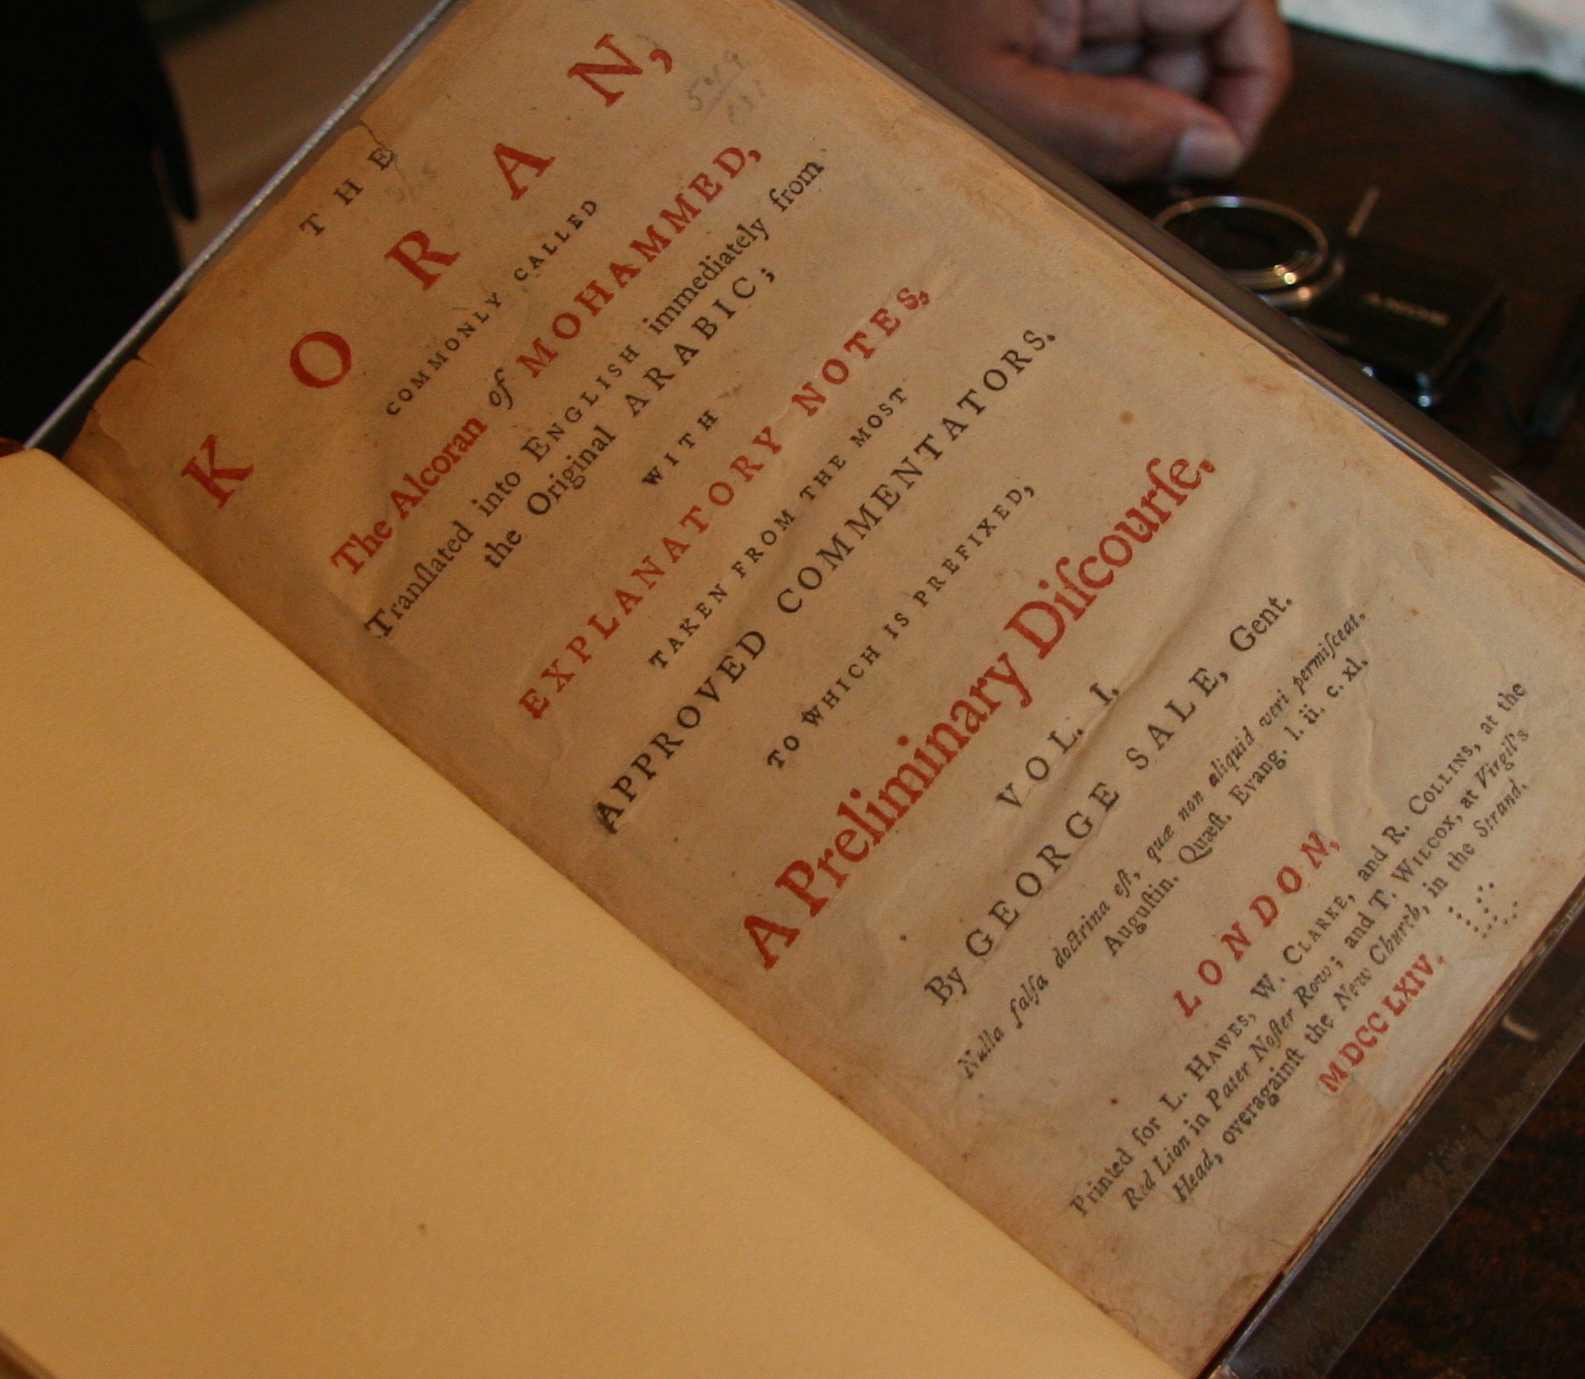 President Thomas Jefferson's copy of the Koran